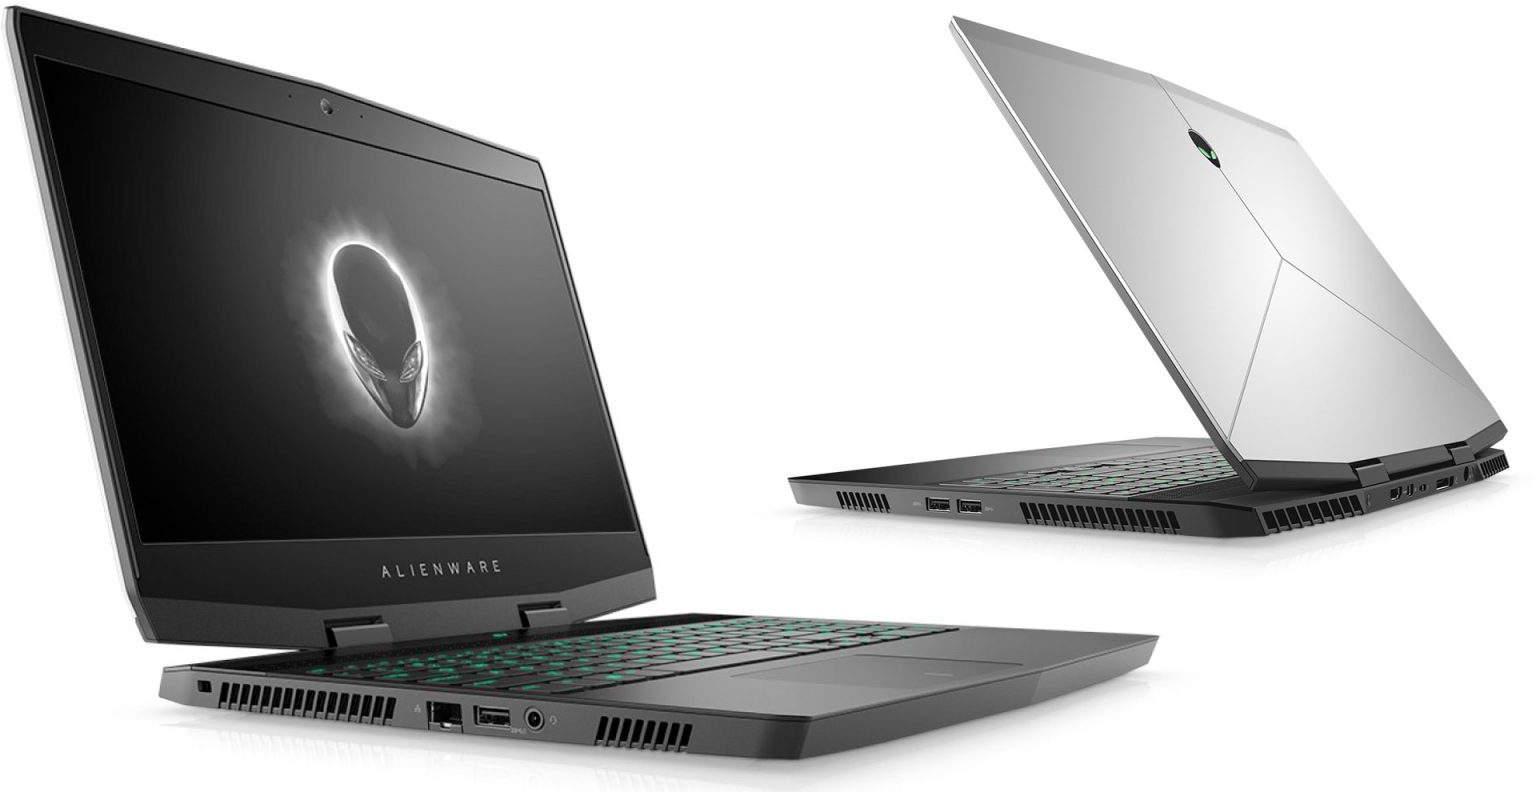 Купить Ноутбук Dell Alienware M15 (M15-5546) фото 3